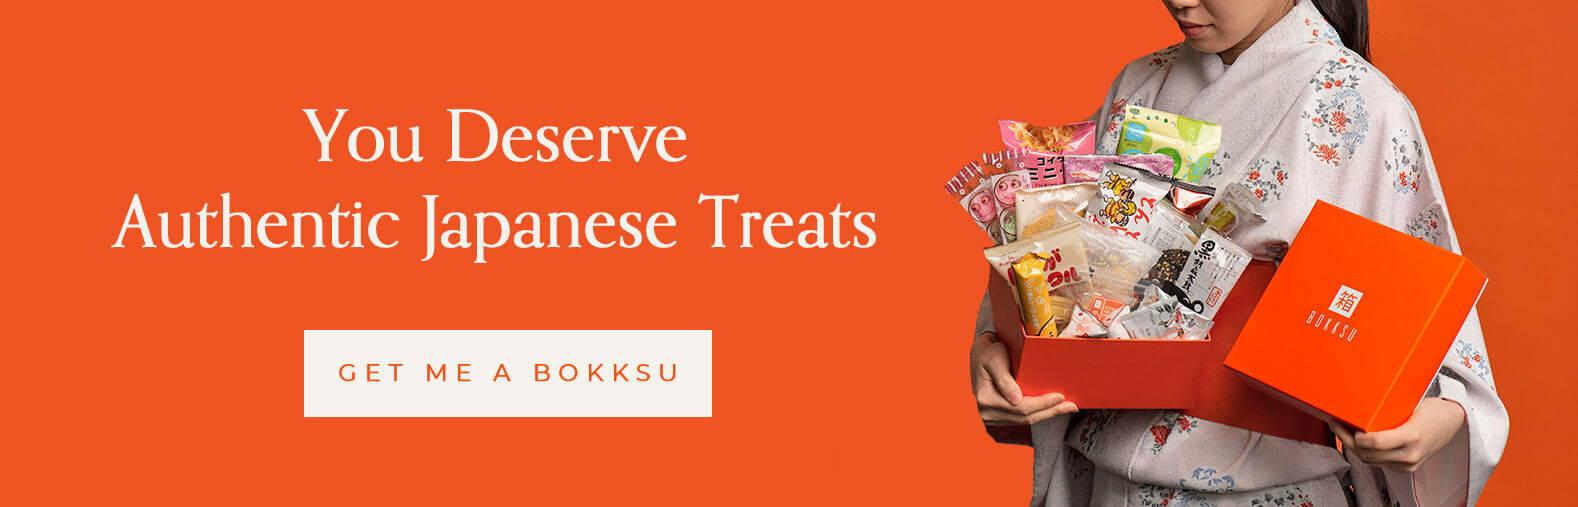 You deserve authentic Japanese treats